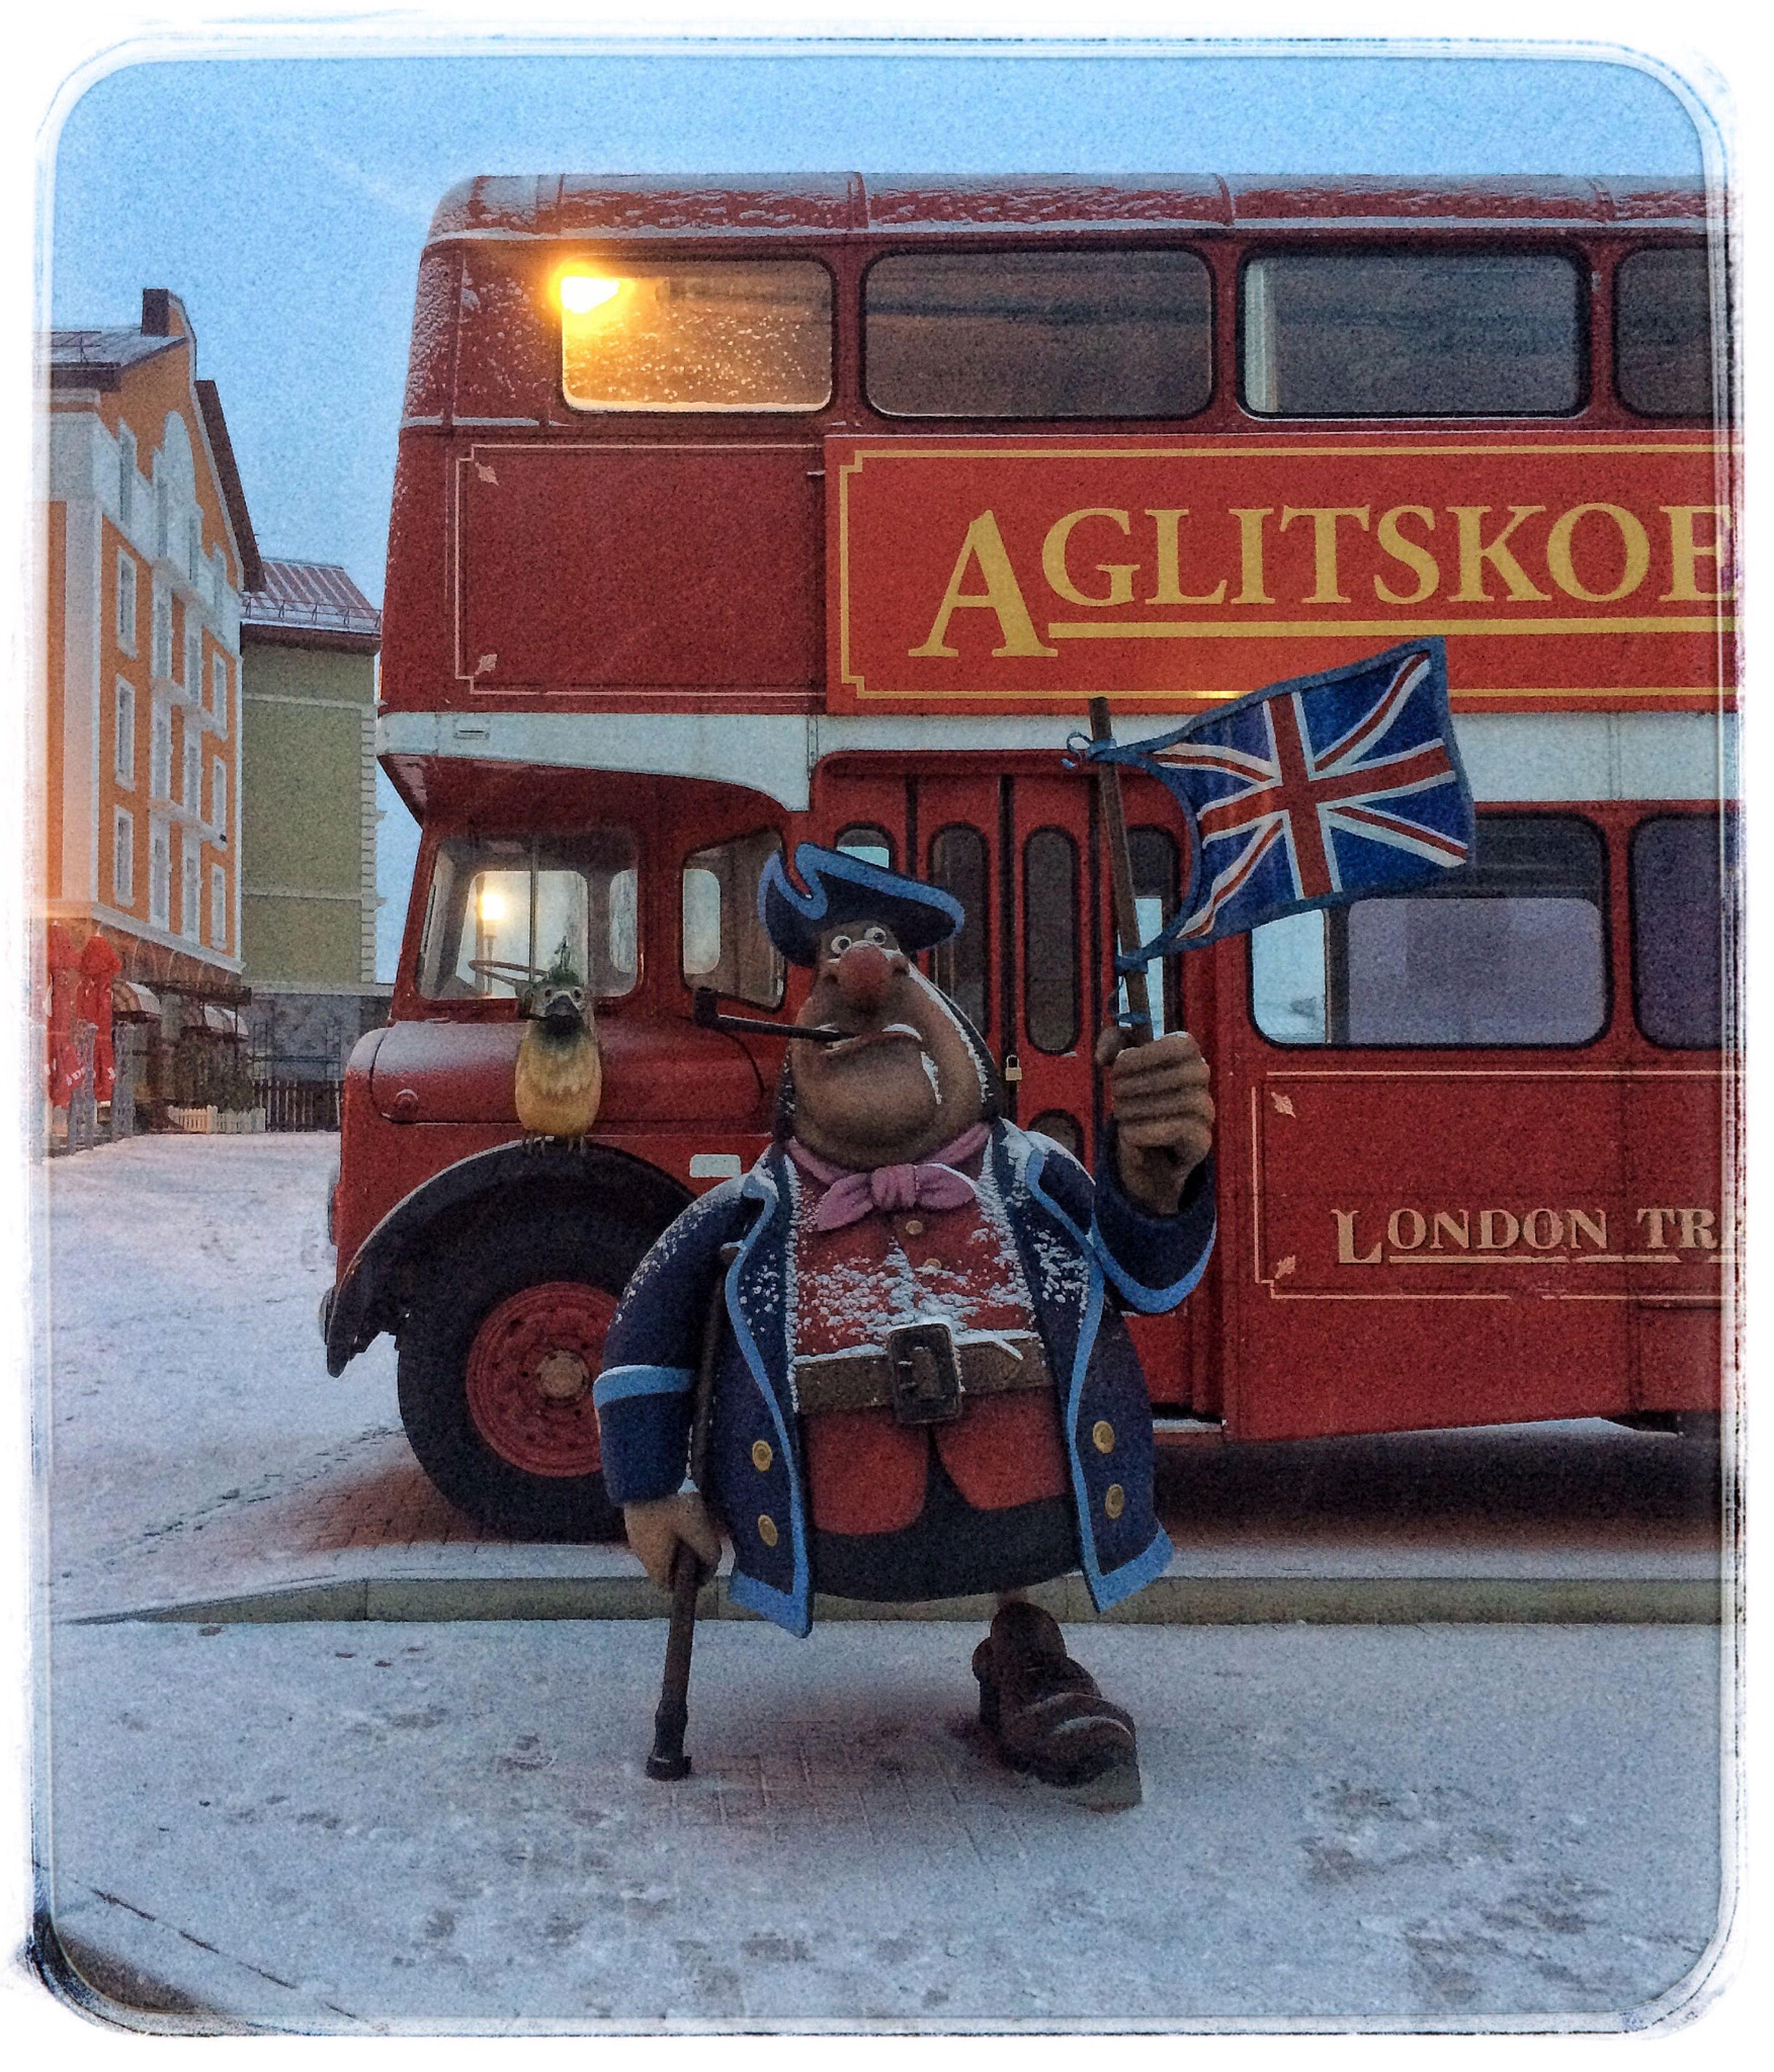 Check This Out Hanging Out из архива From Archive Russia Ryazan Россия Рязань Streetphotography английский автобус пират остров сокровищ Персонаж снегопад Snowfalling